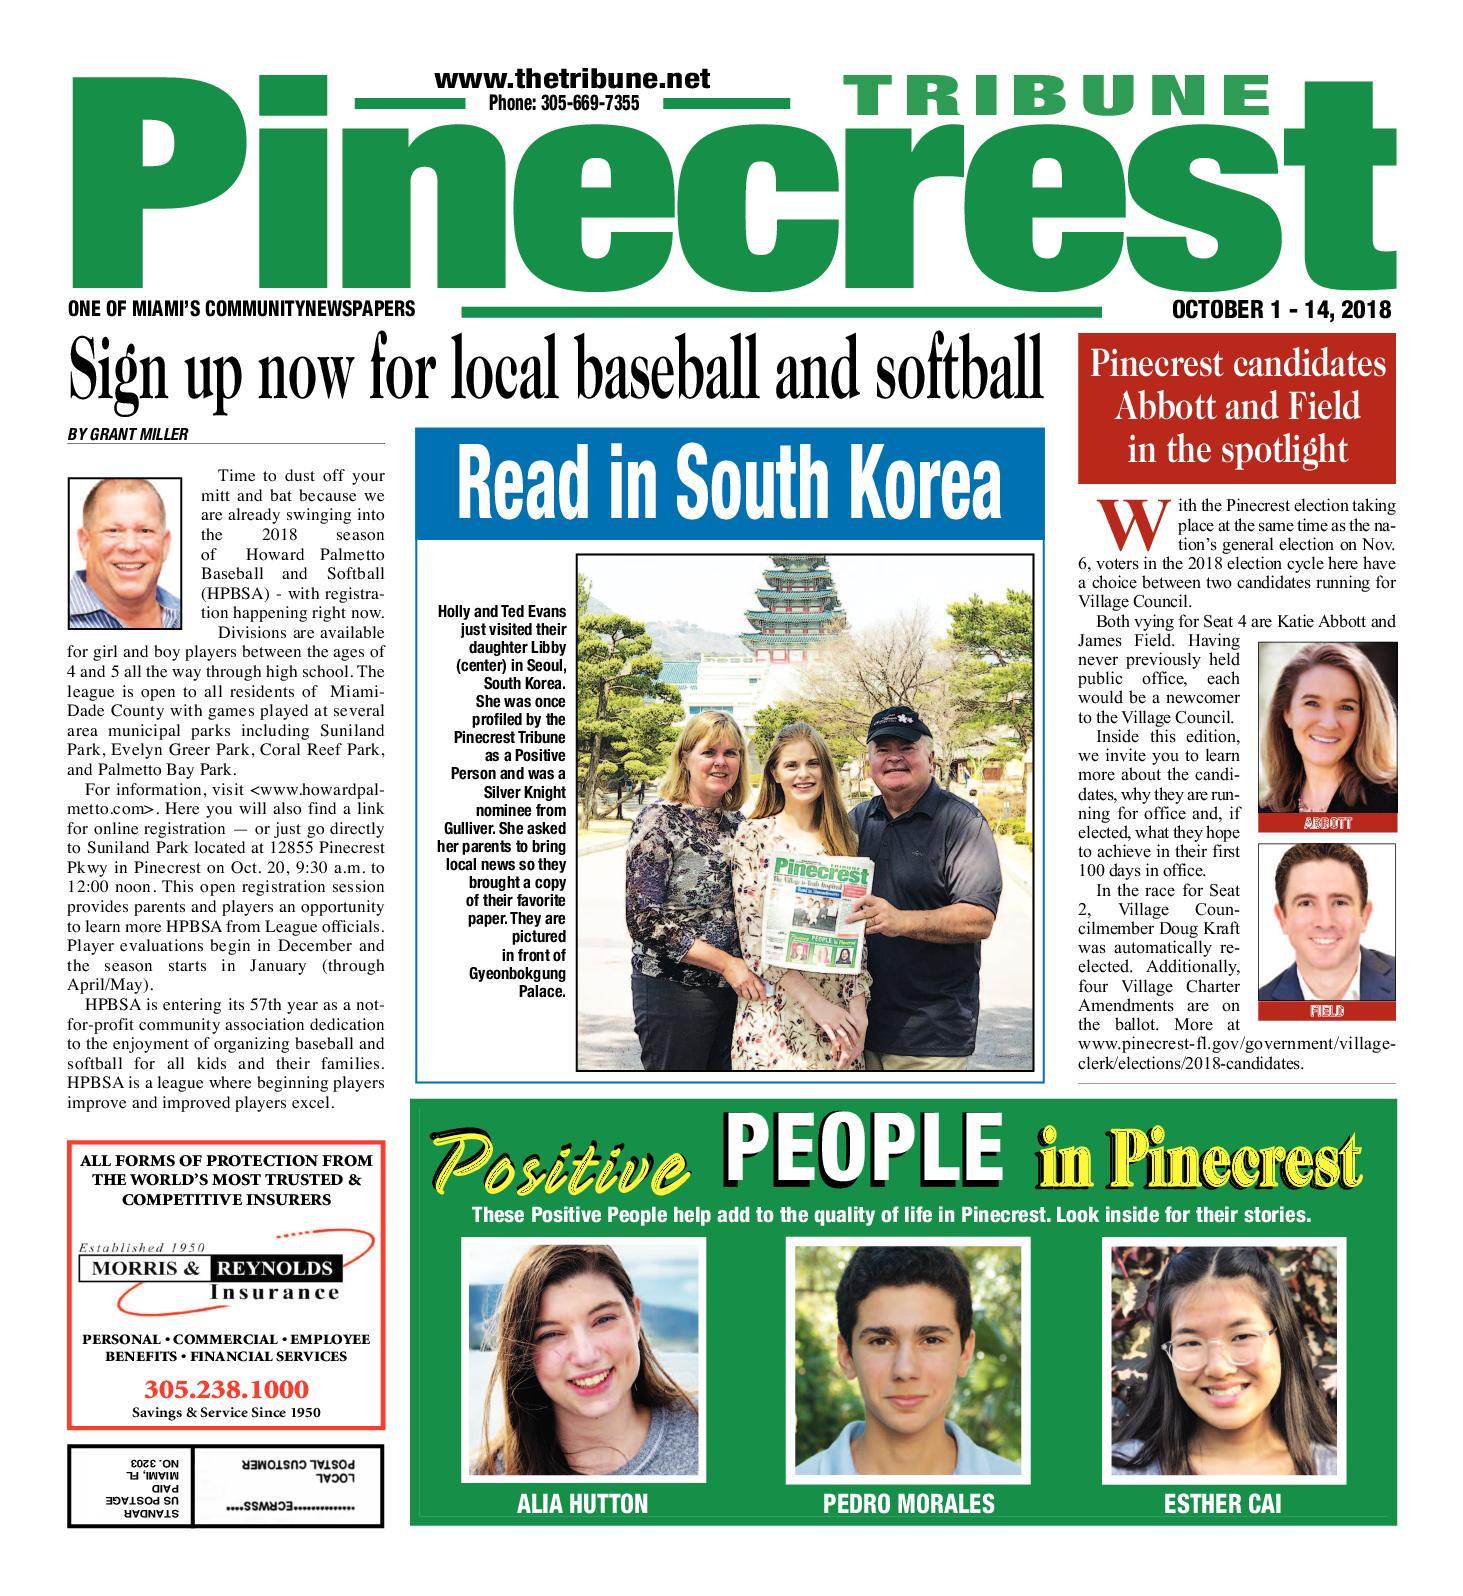 Calaméo - Pinecrest Tribune 10 1 2018